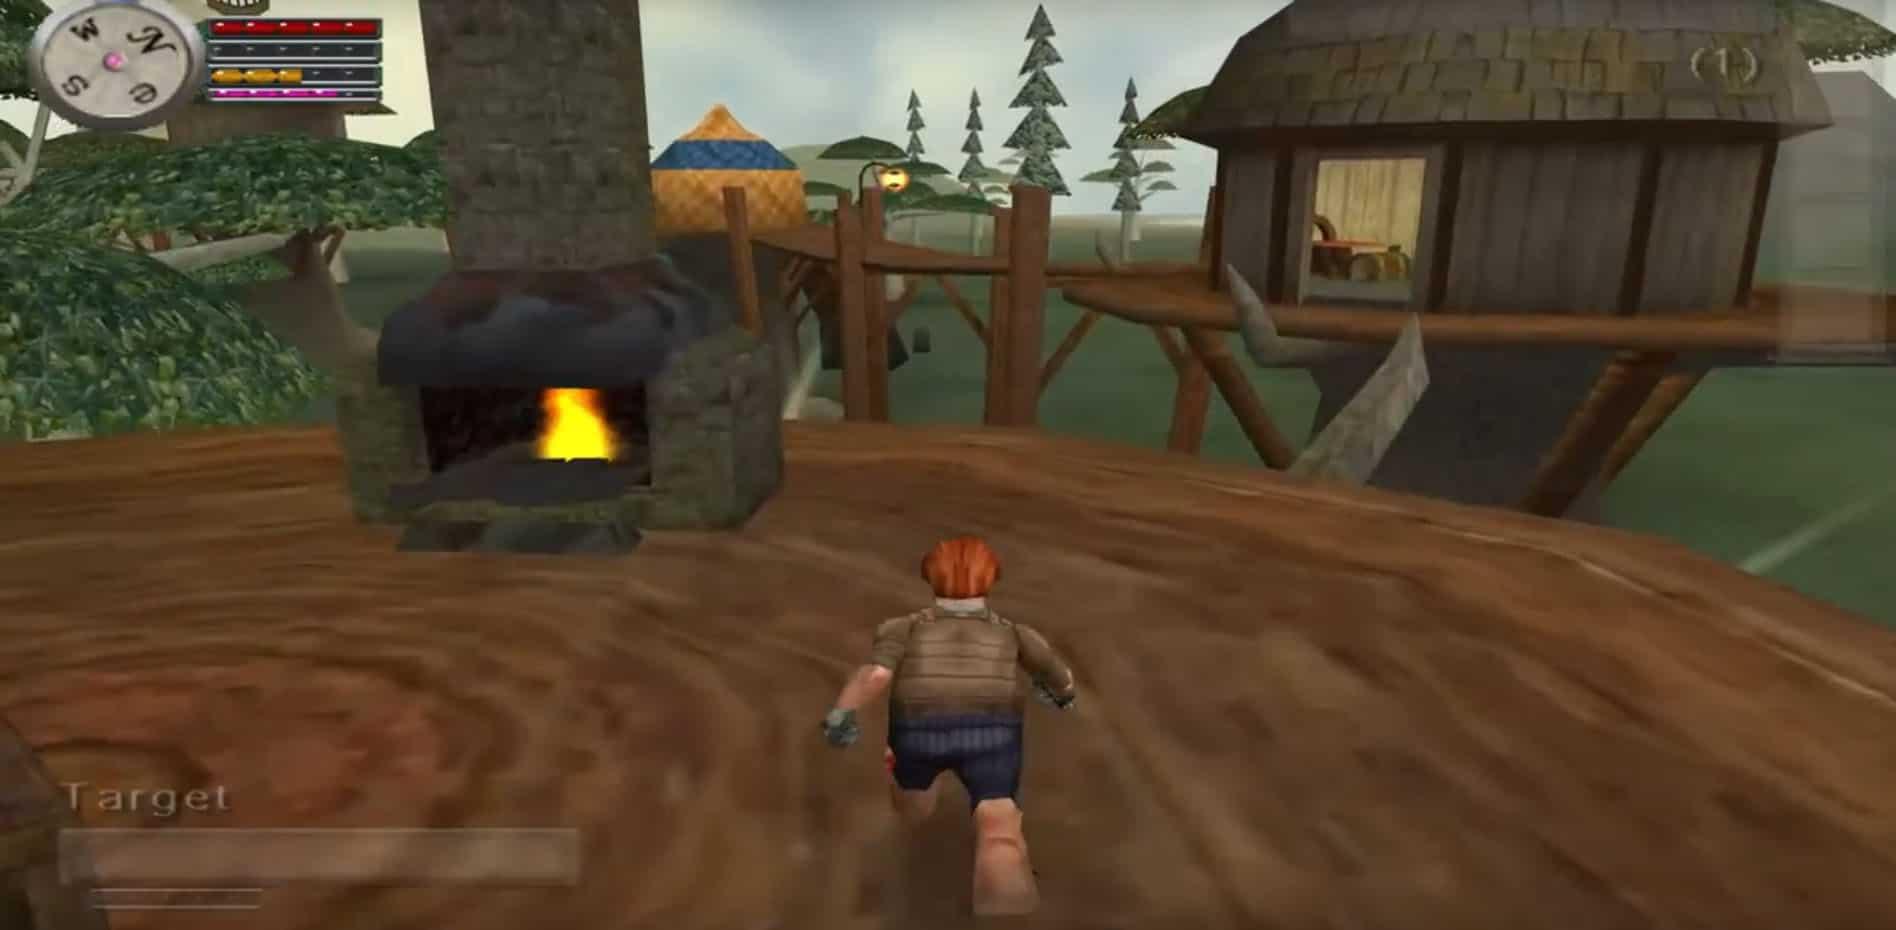 Everquest Online Adventures Private Server Footage 4